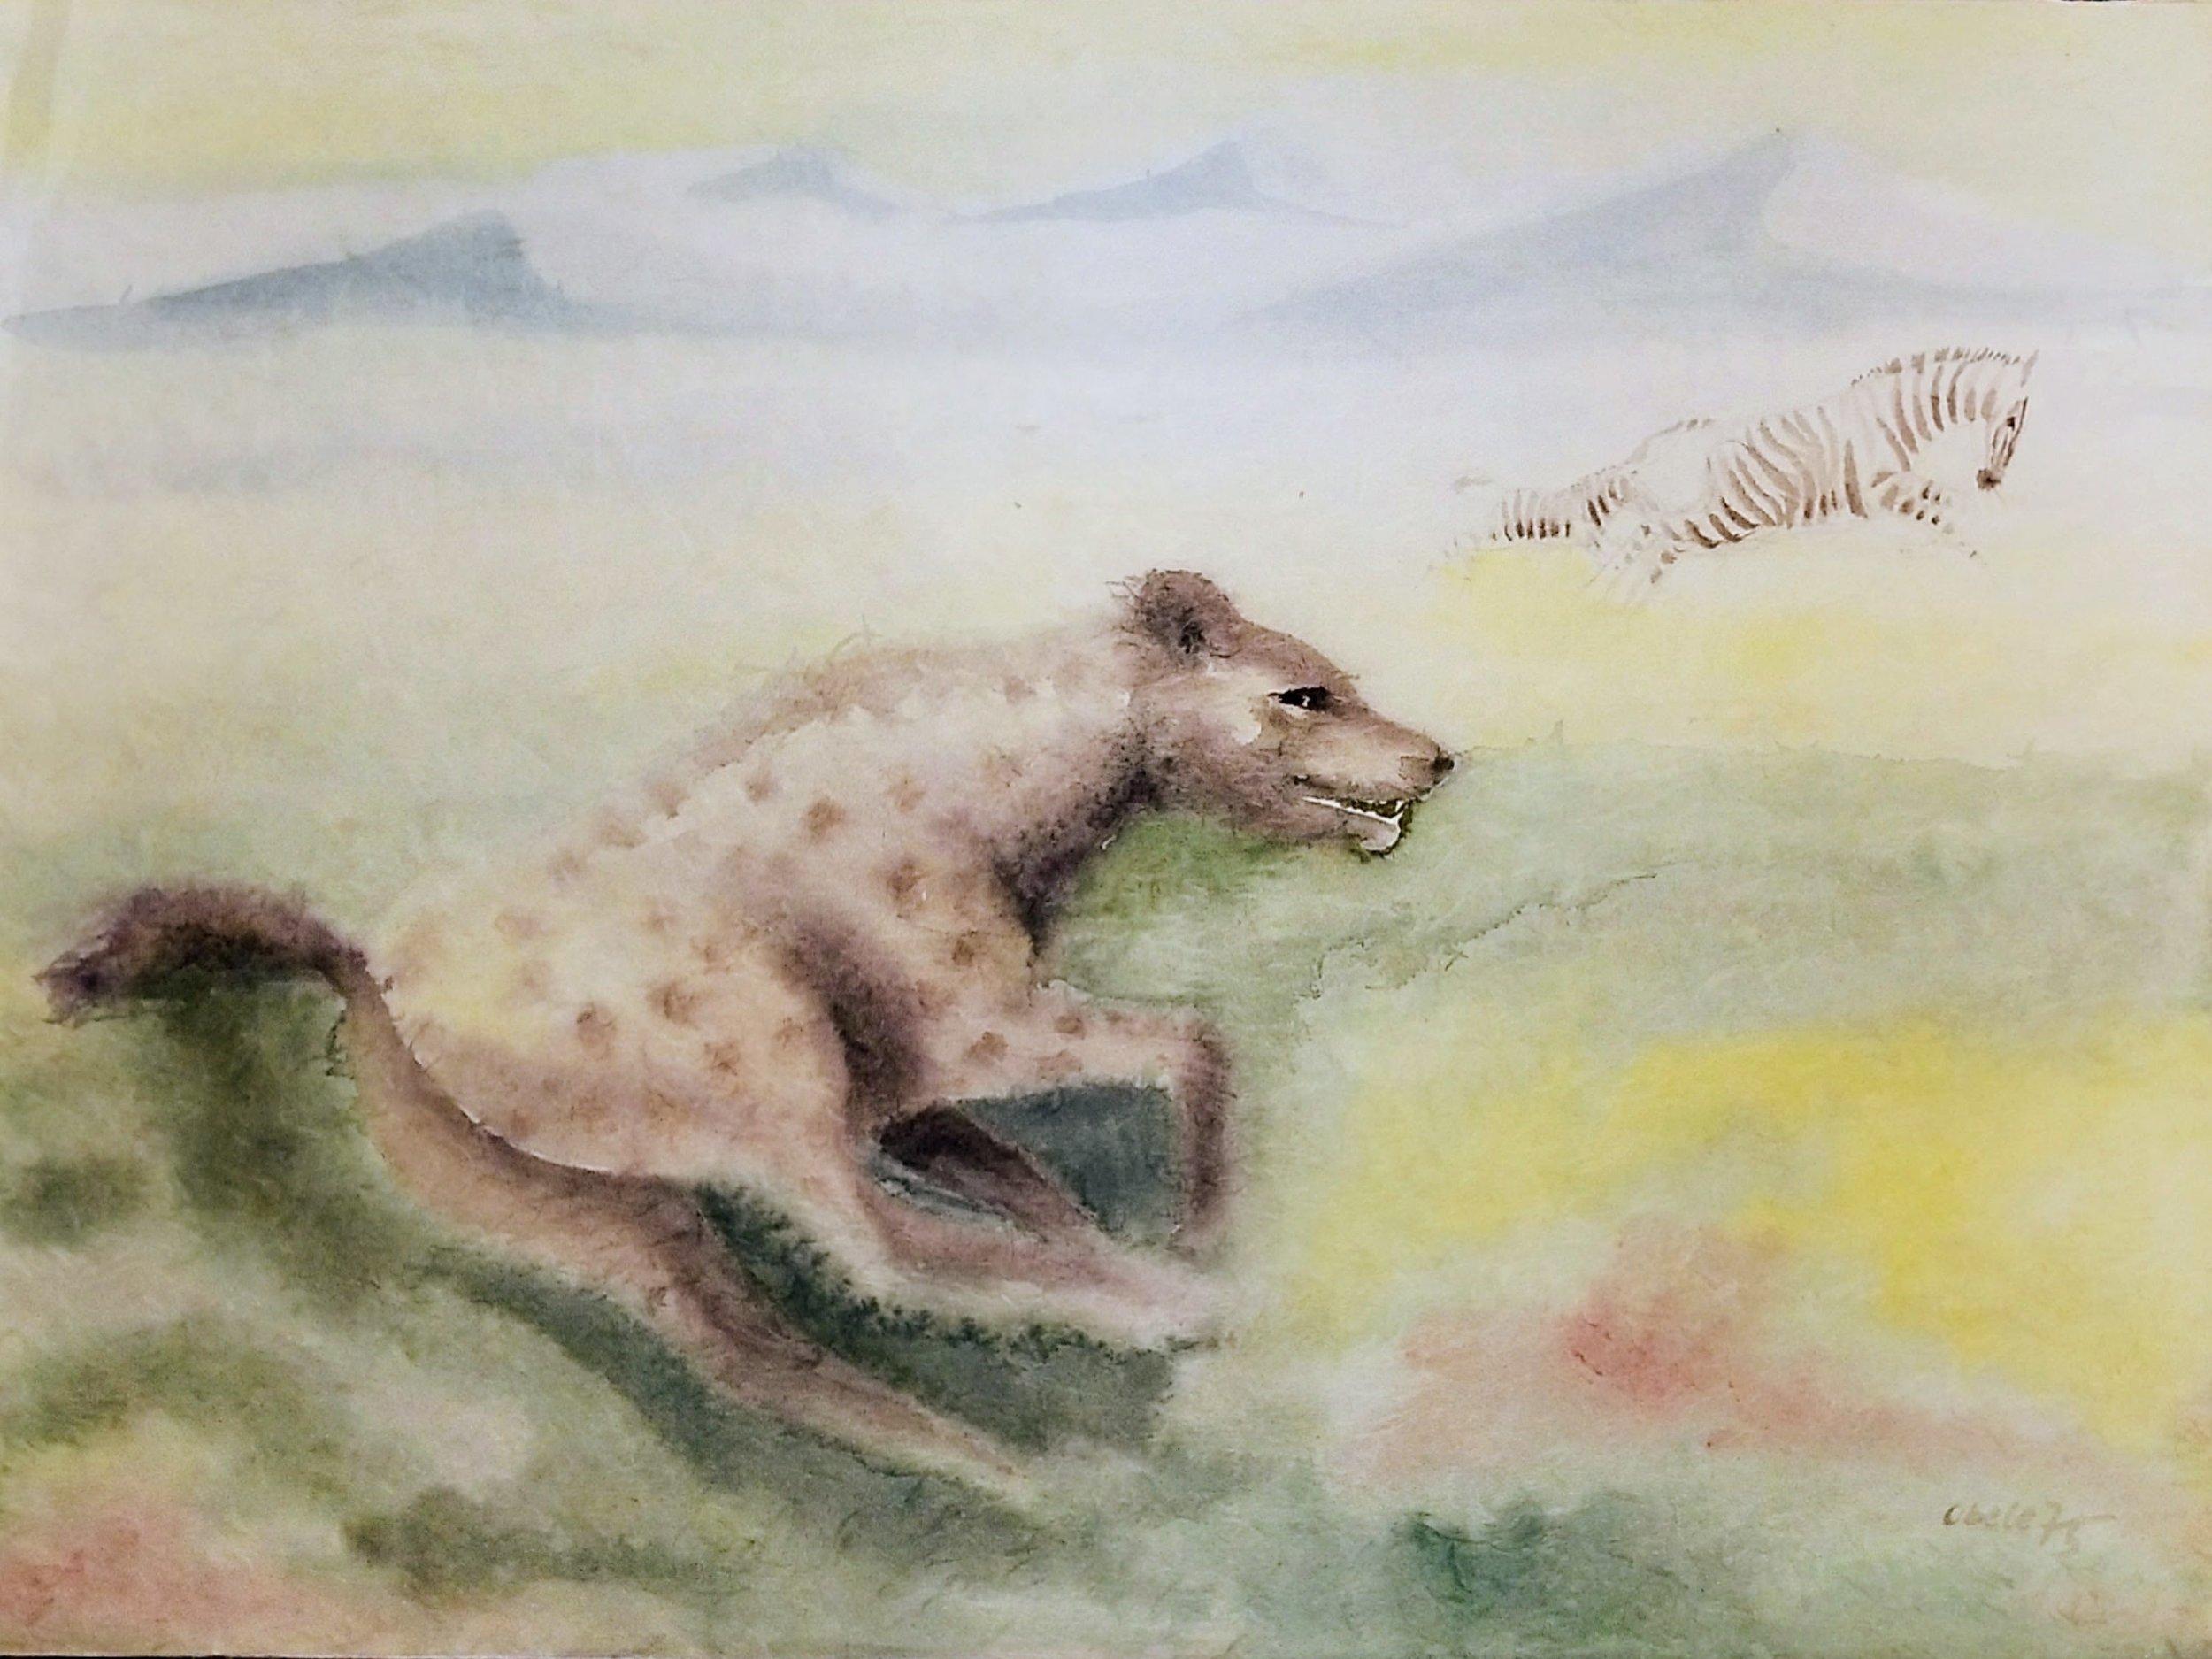 Jagende Tüpfelhyäne / Hunting Spotted Hyena